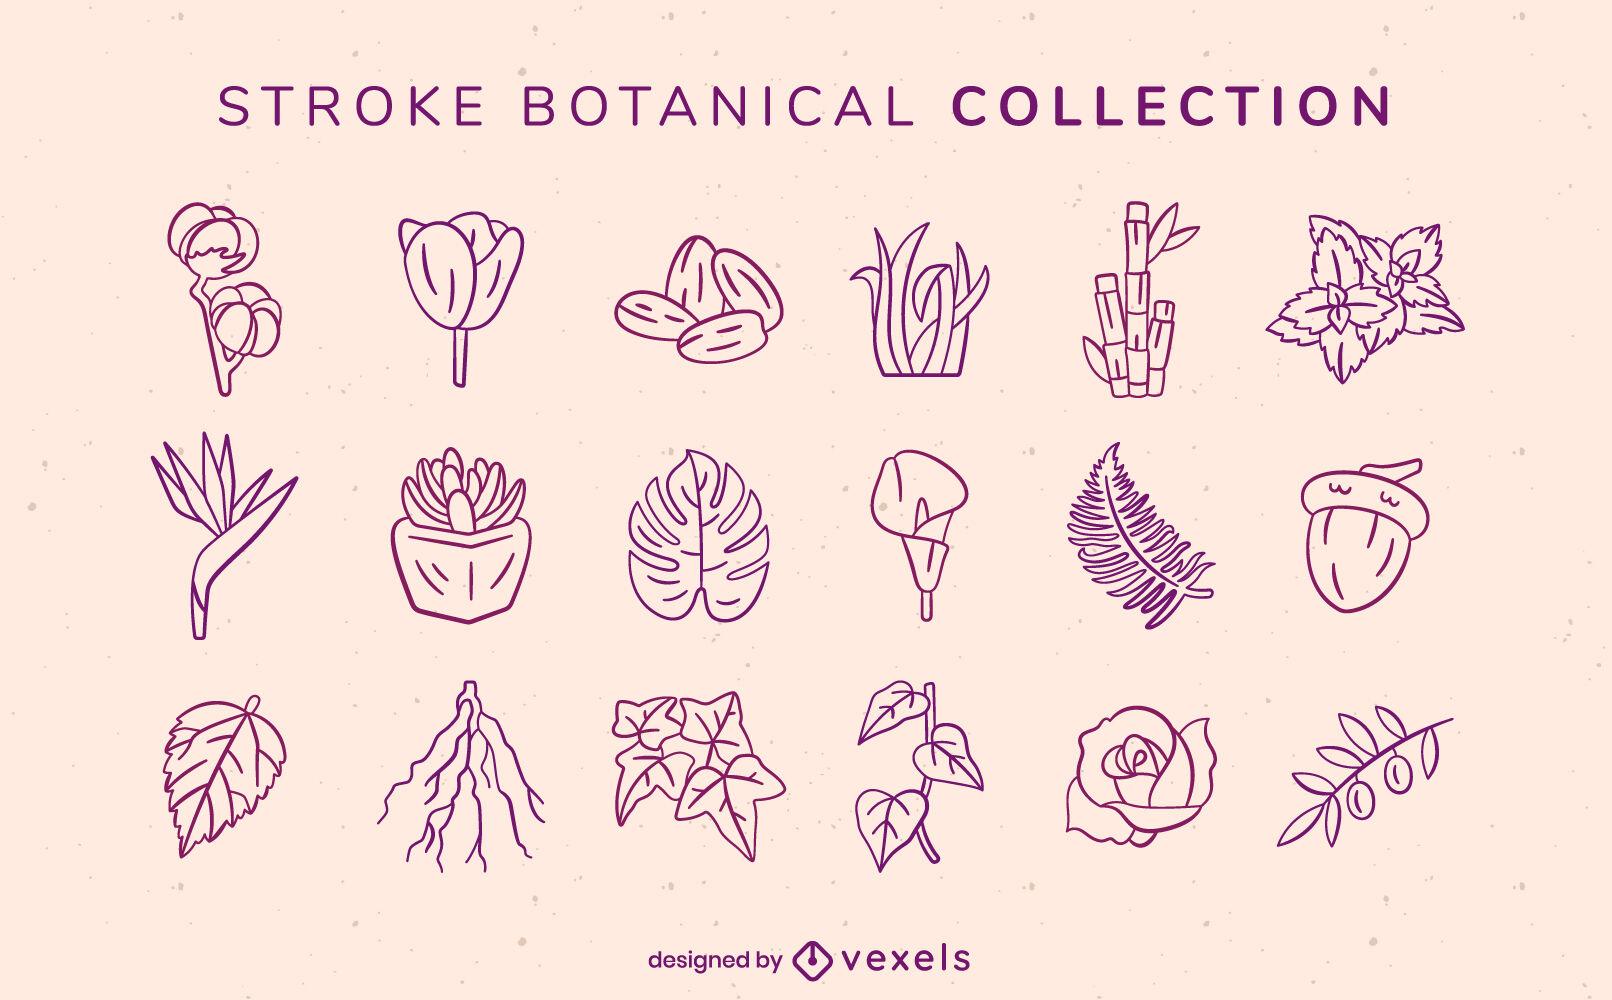 Botanical flowers and leaves stroke set